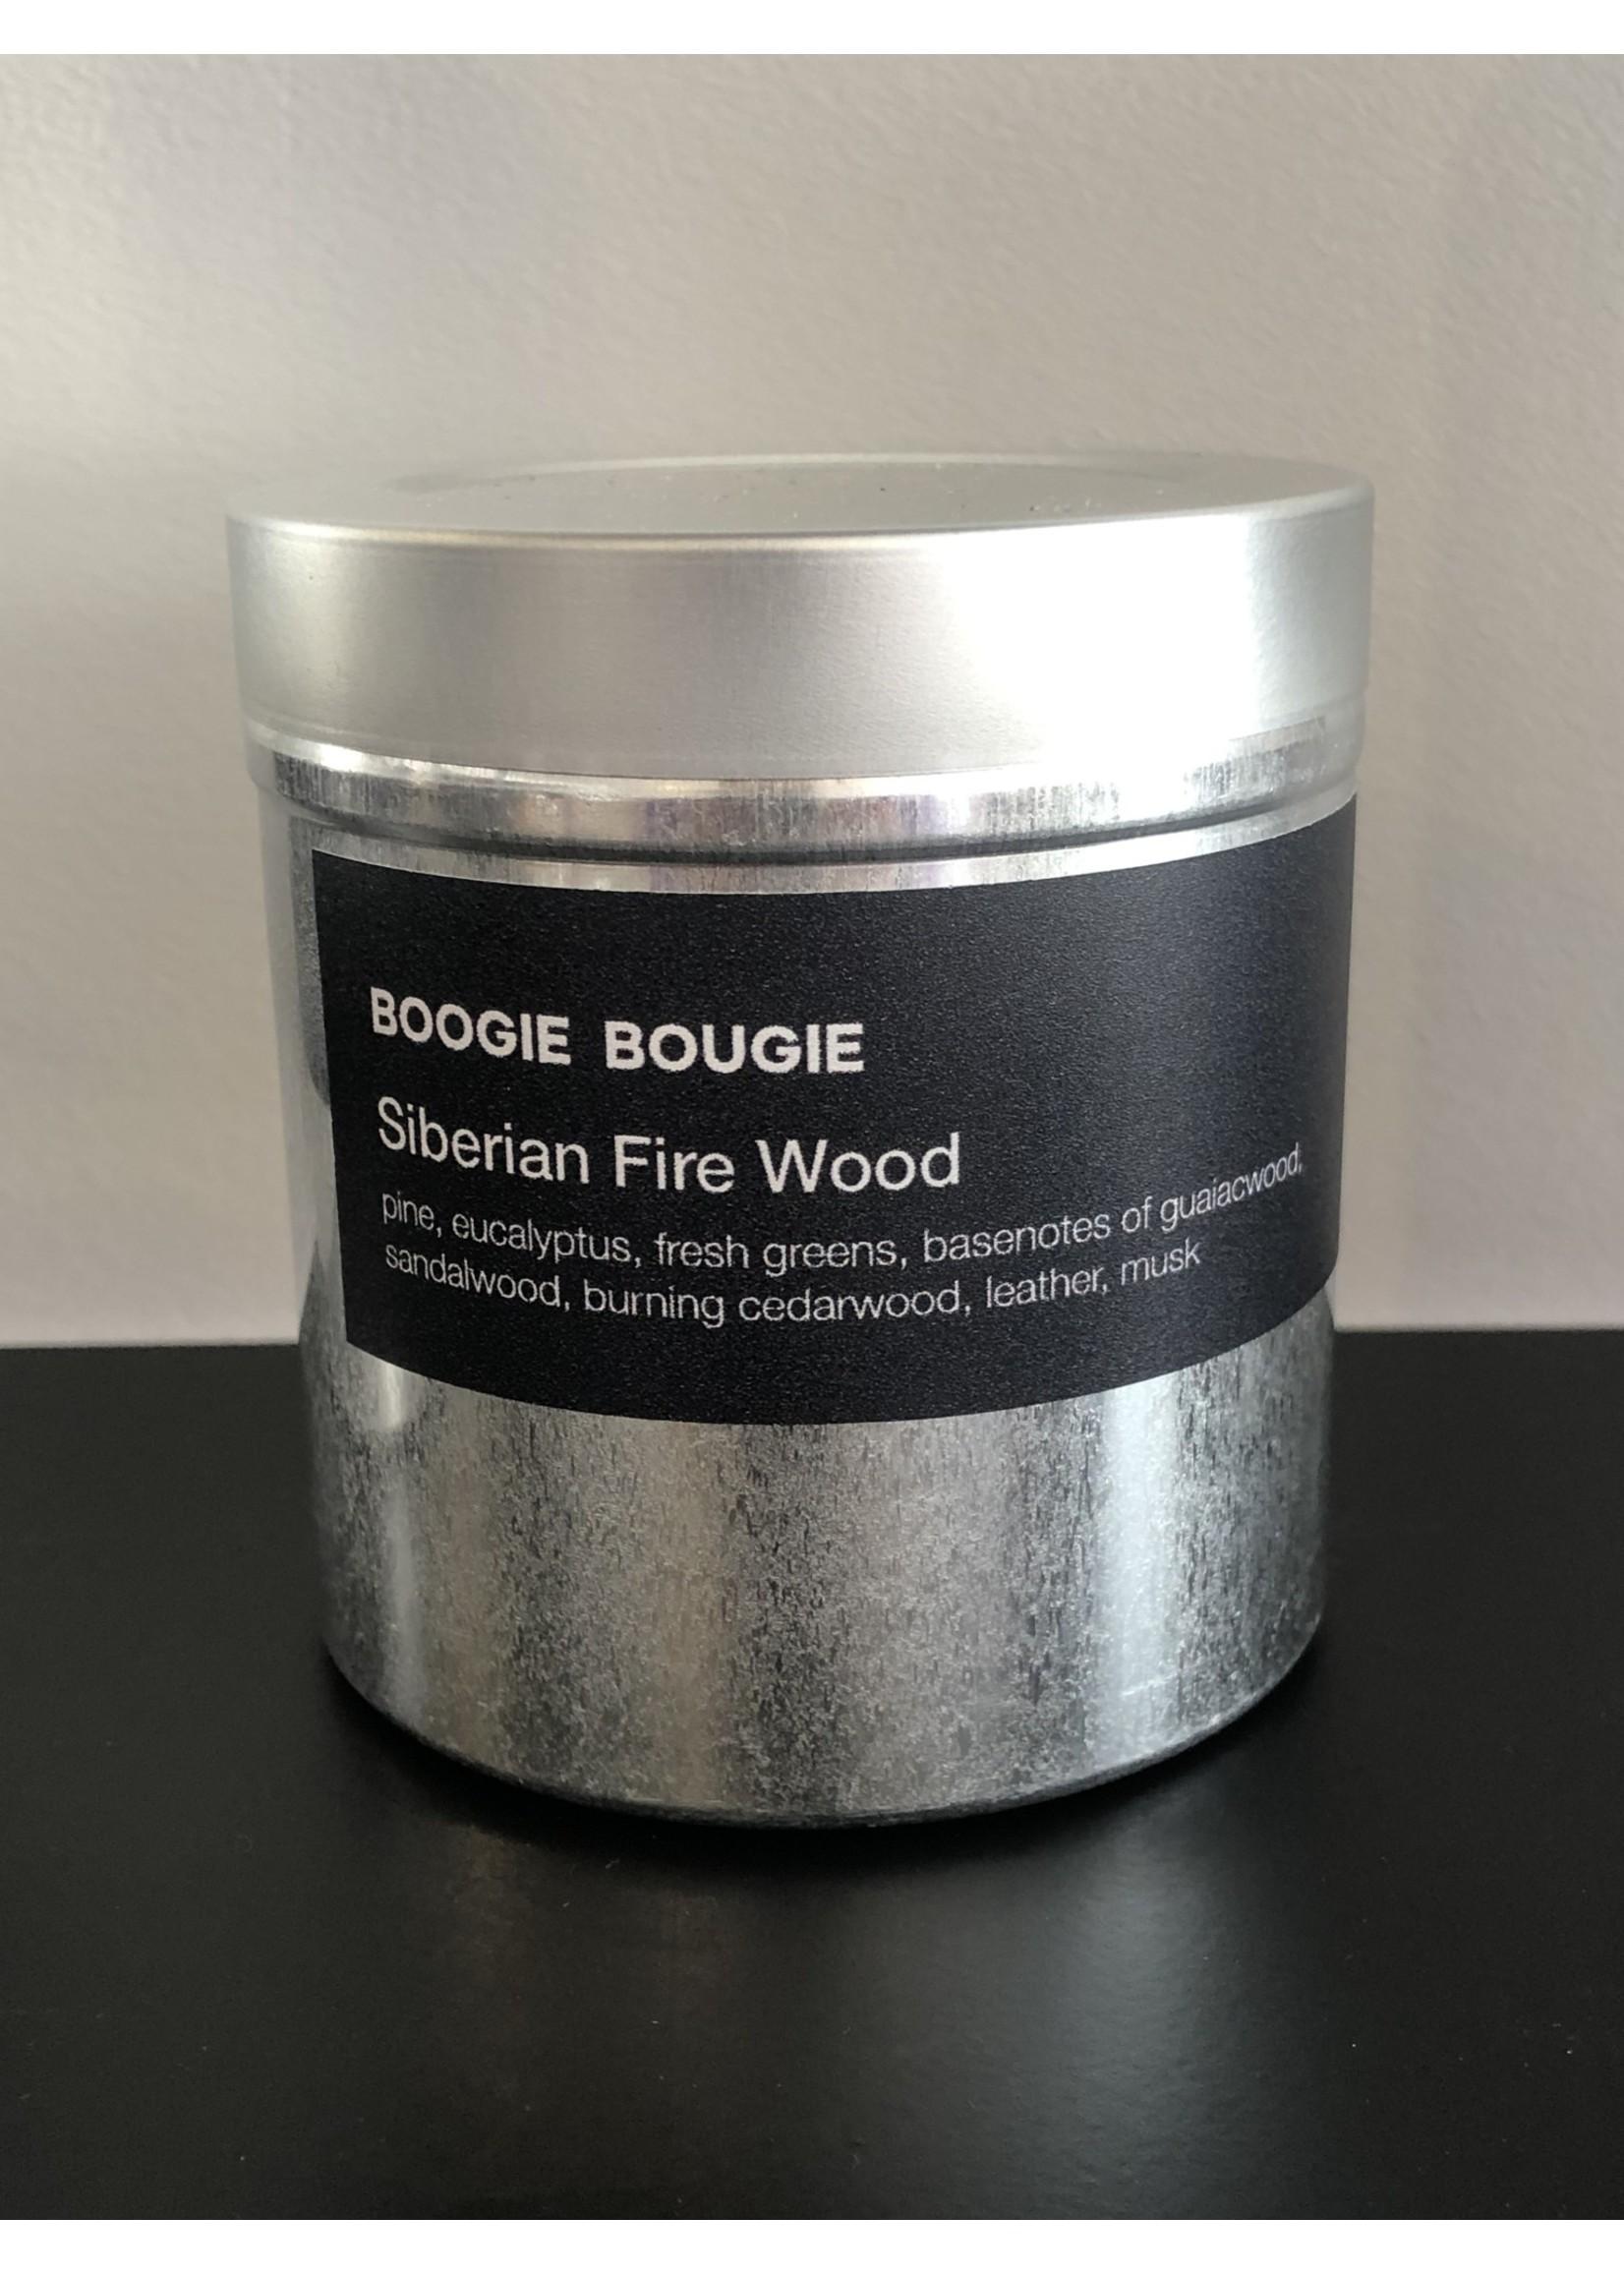 BOOGIE BOUGIE Boogie Bougie Geurkaars Siberian Fire Wood